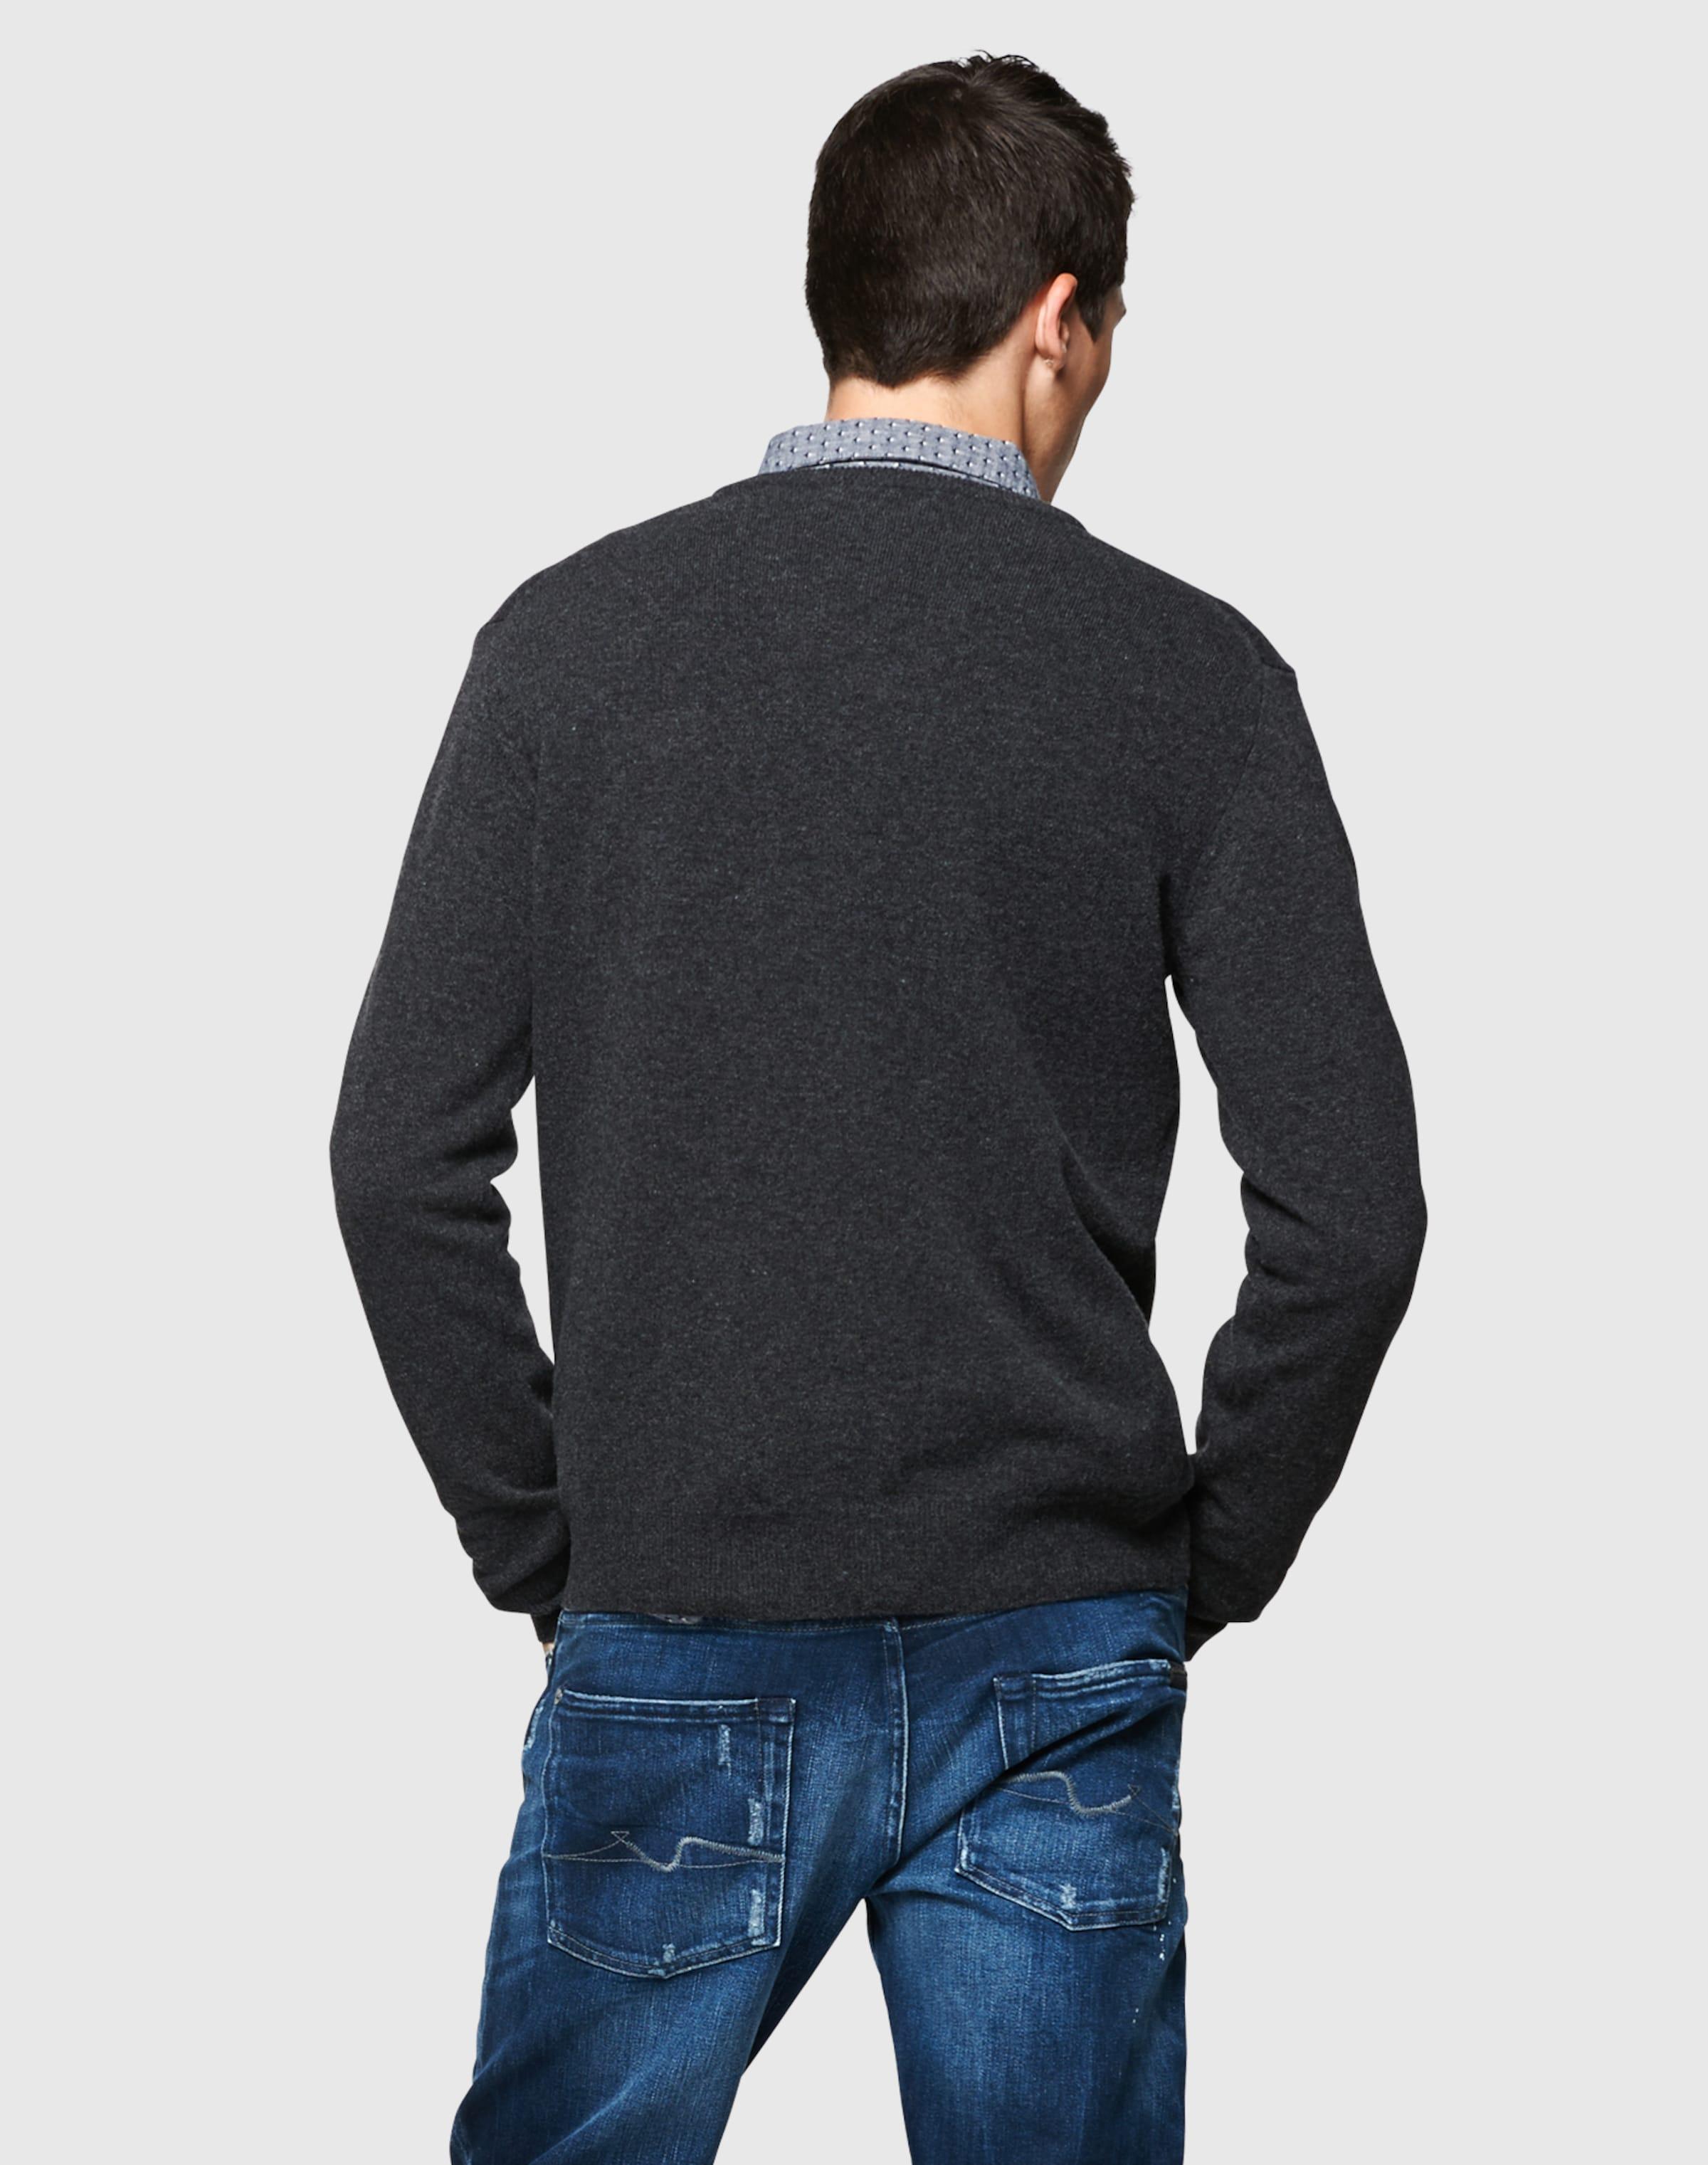 Gant Anthrazit In In Pullover Anthrazit Gant Pullover N0wOvm8n